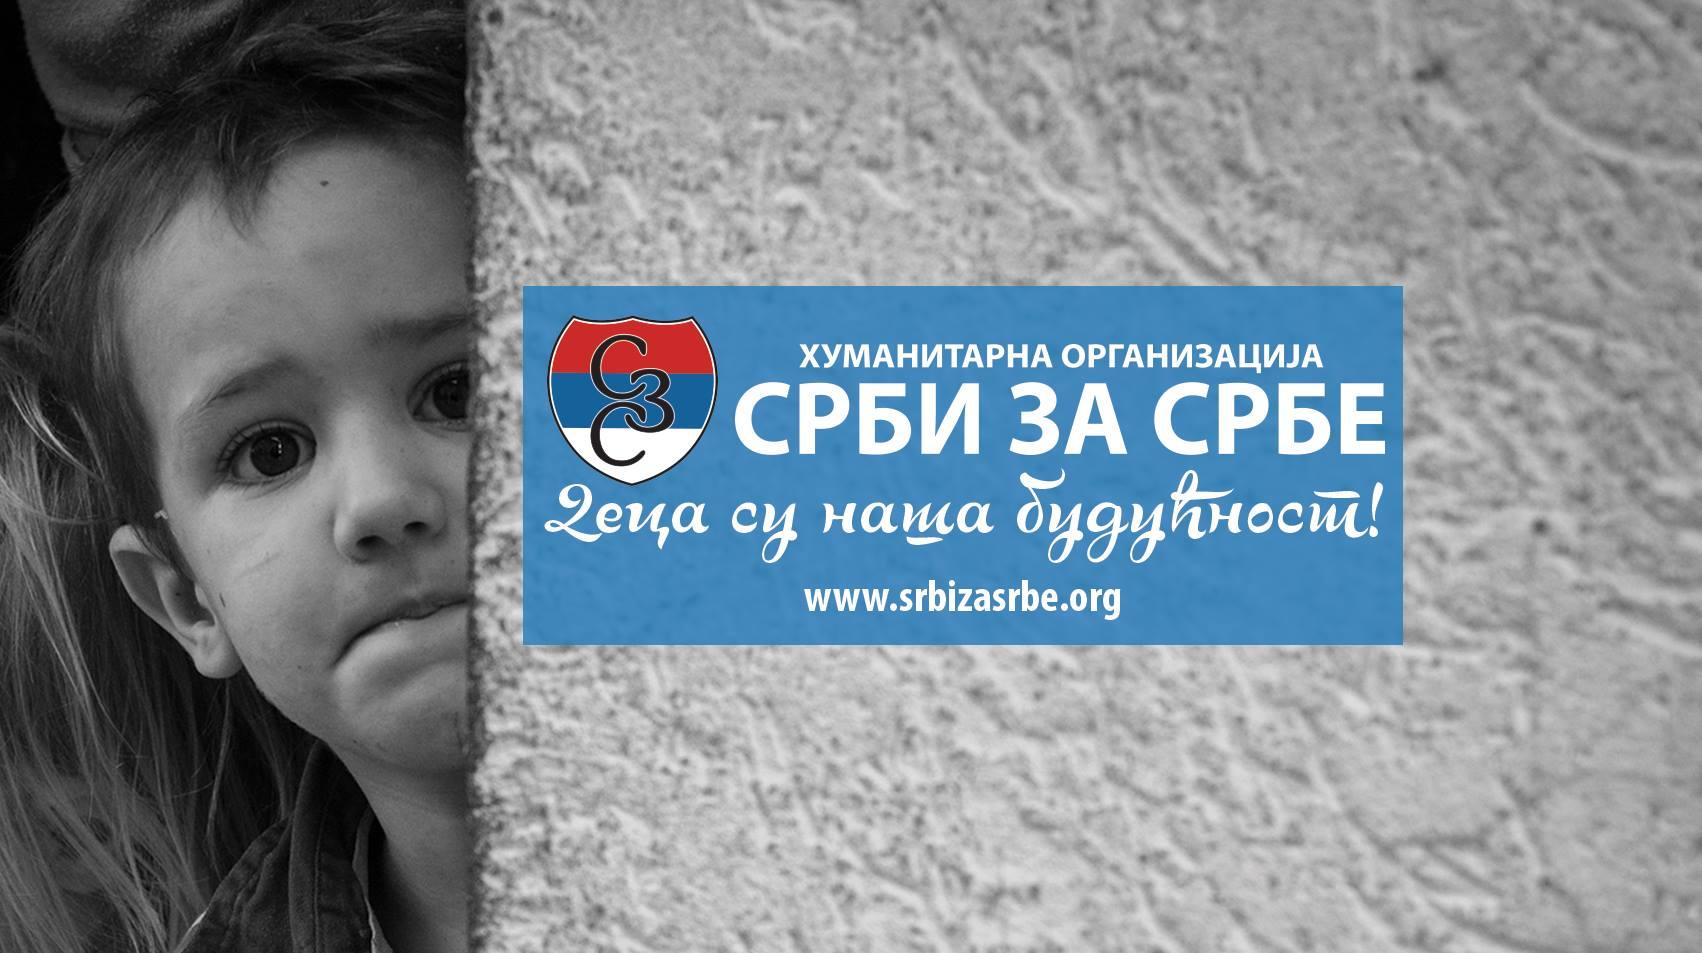 humanitarna organizacija srbi za srbe humanitarian organization serbs for serbs humanity